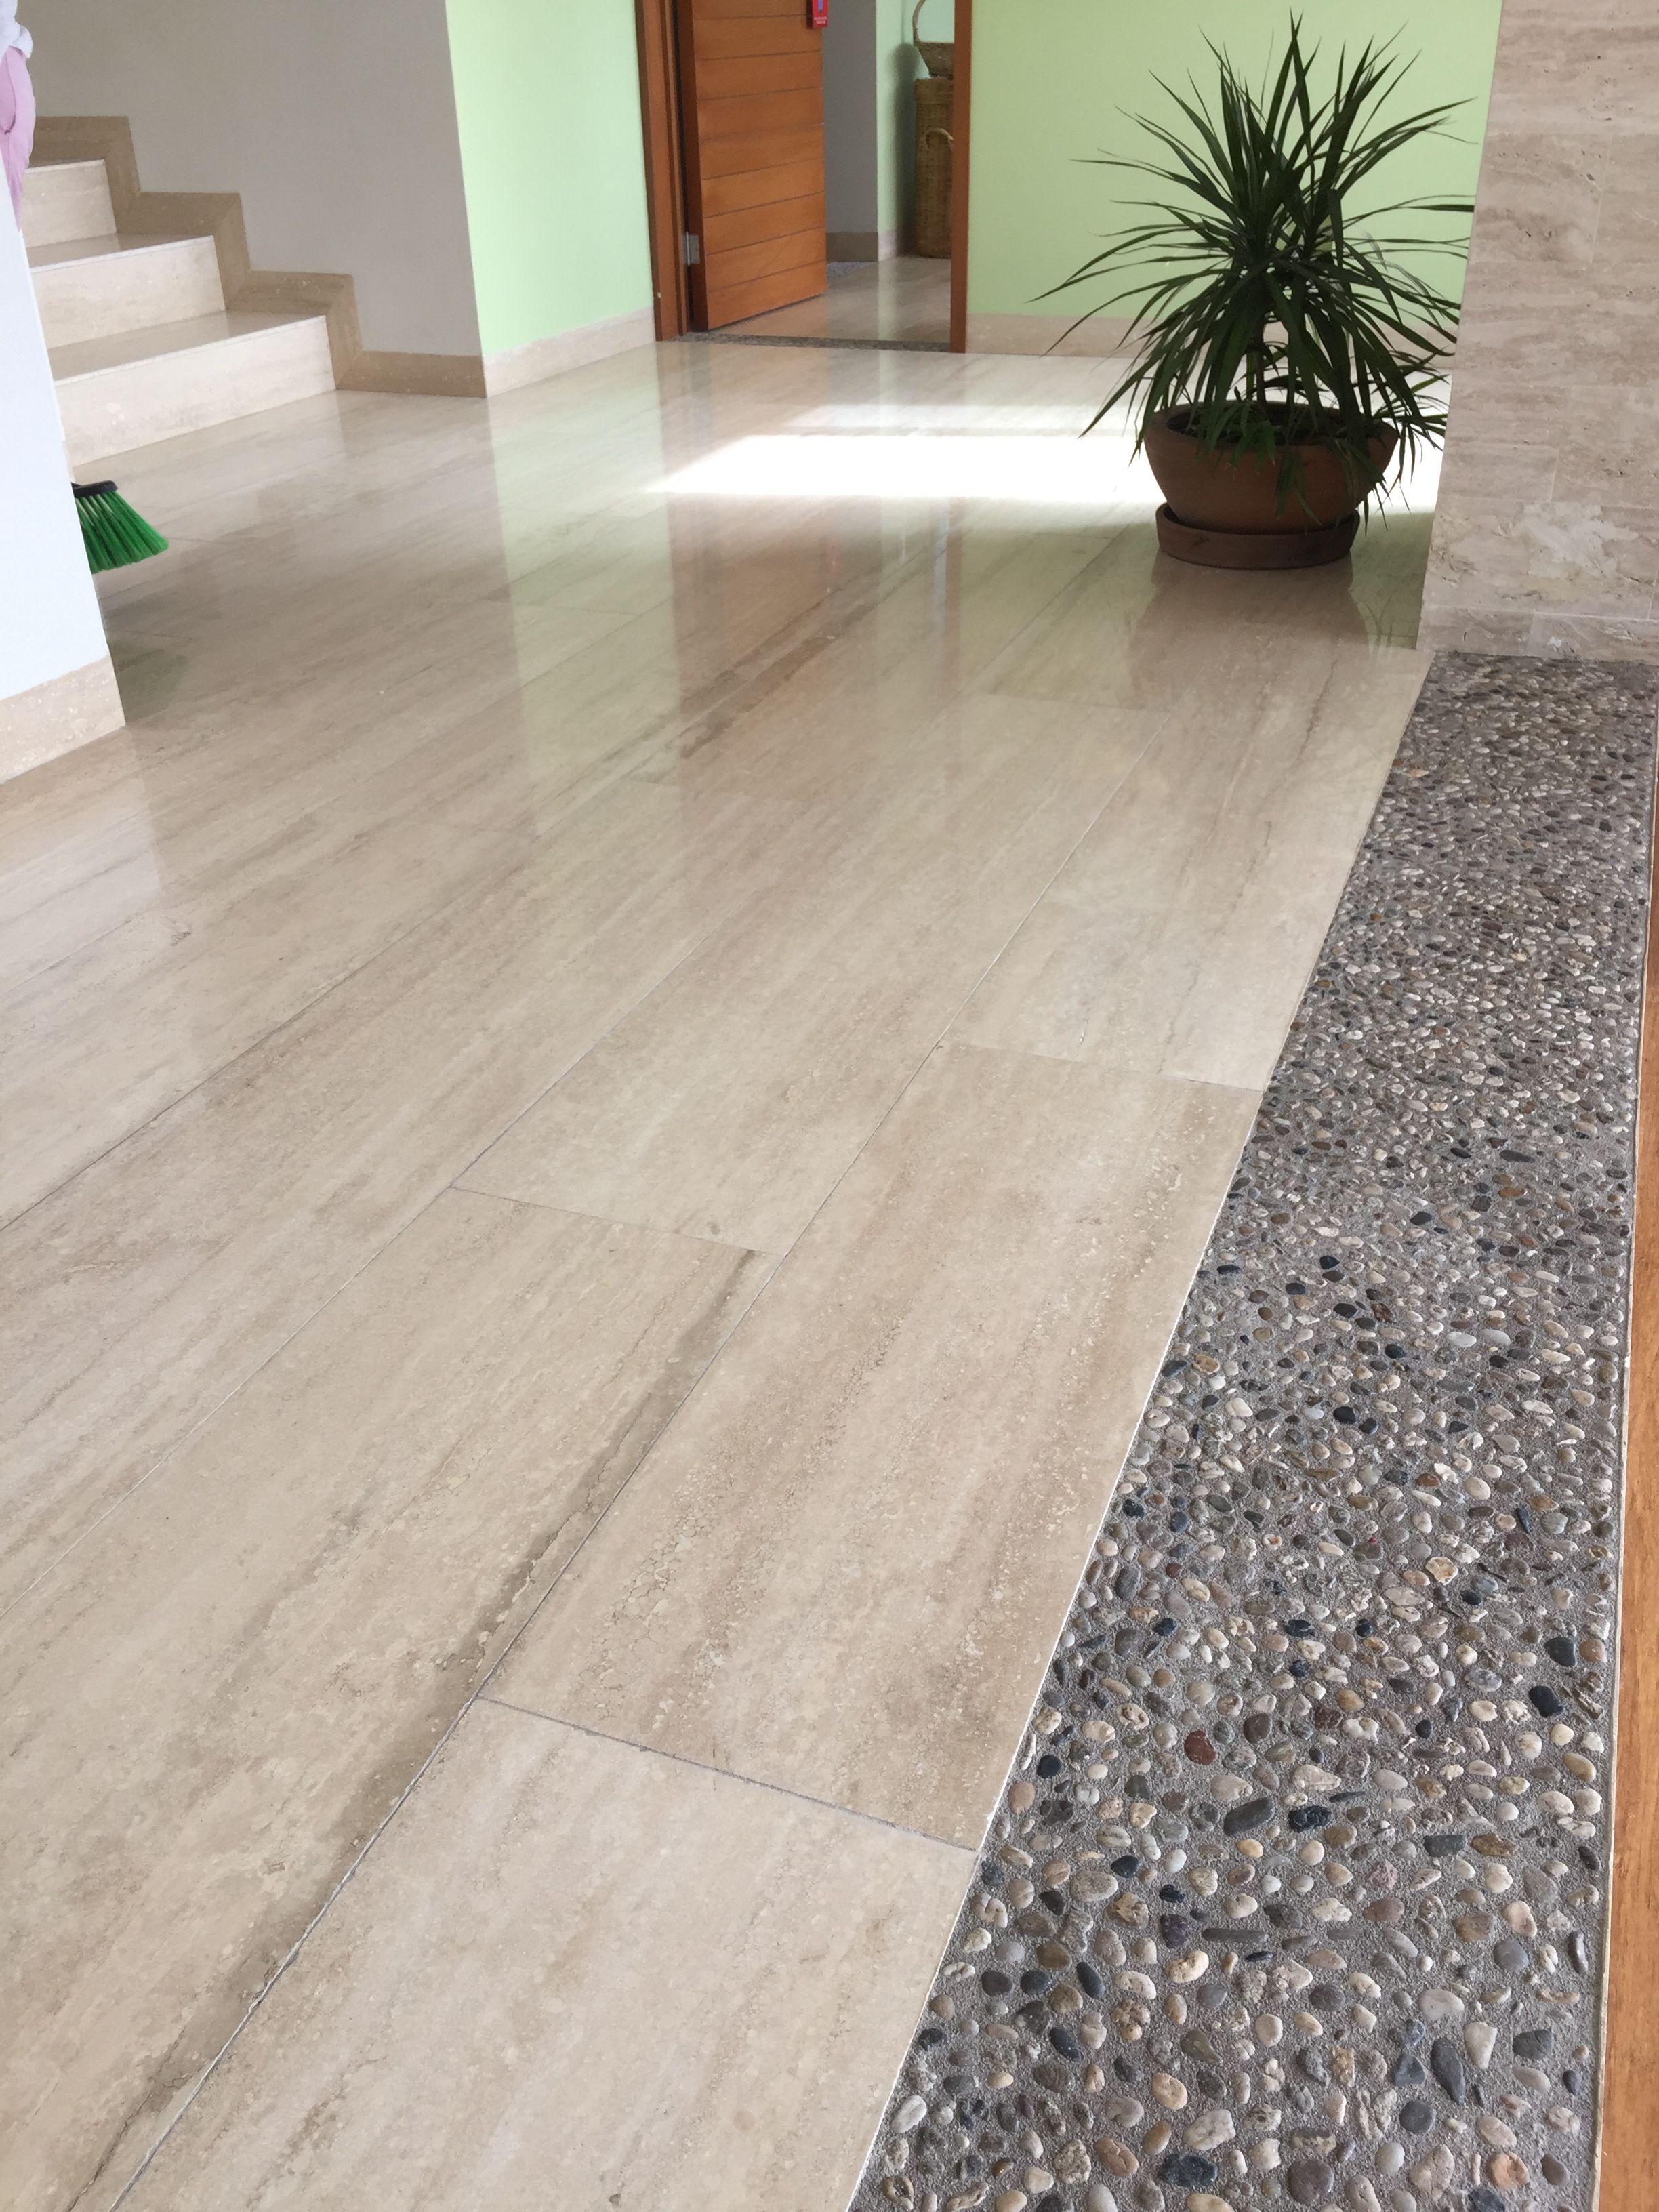 Pisos de m rmol que embellecen tus espacios whatsapp 442 for Tipos de ceramicas para pisos interiores